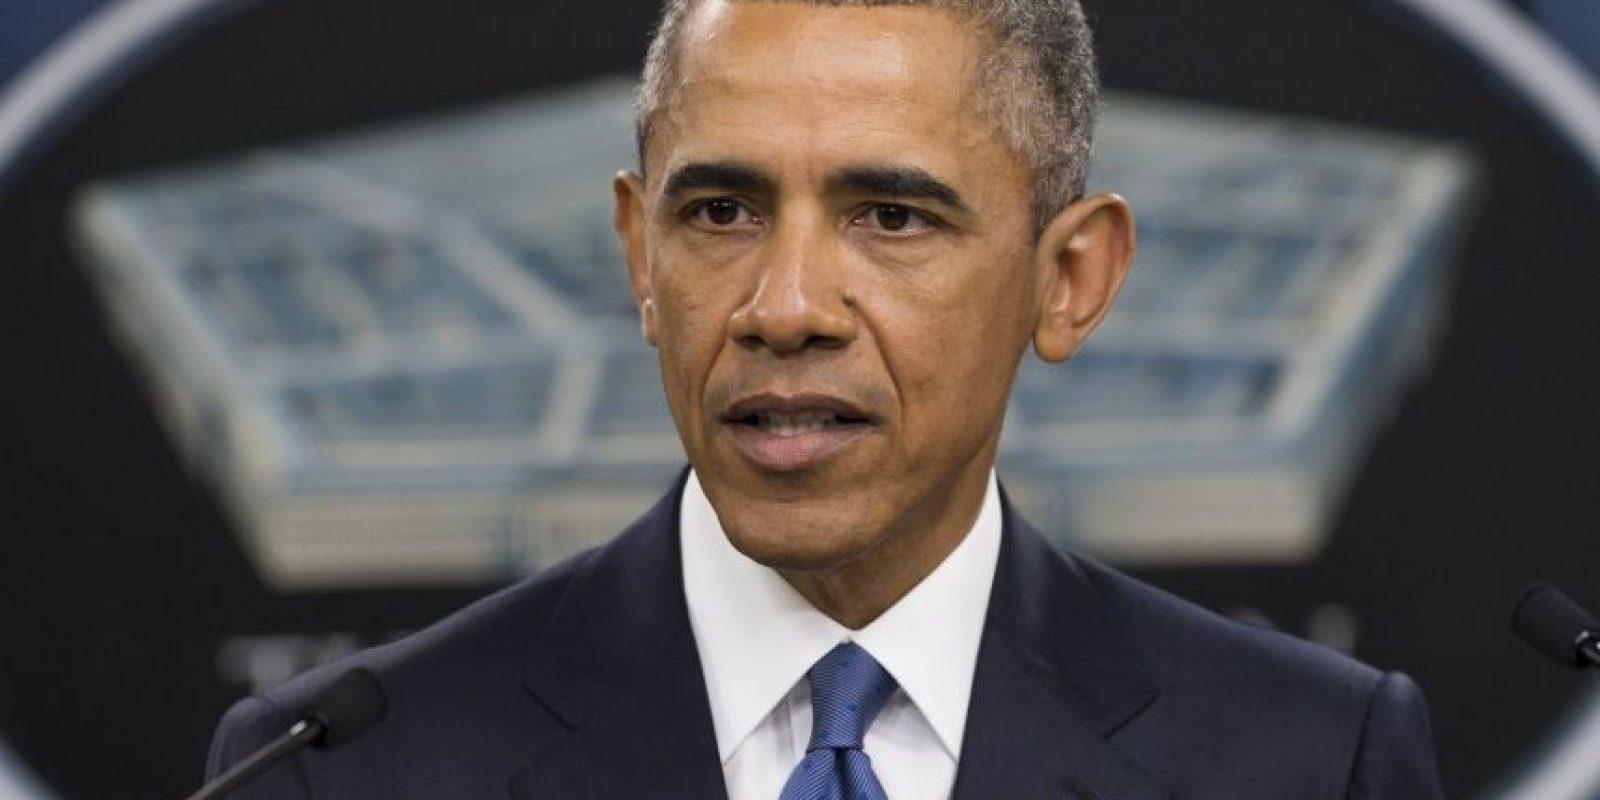 Obama habló sobre la guerra contra el Estado Islámico Foto:AFP